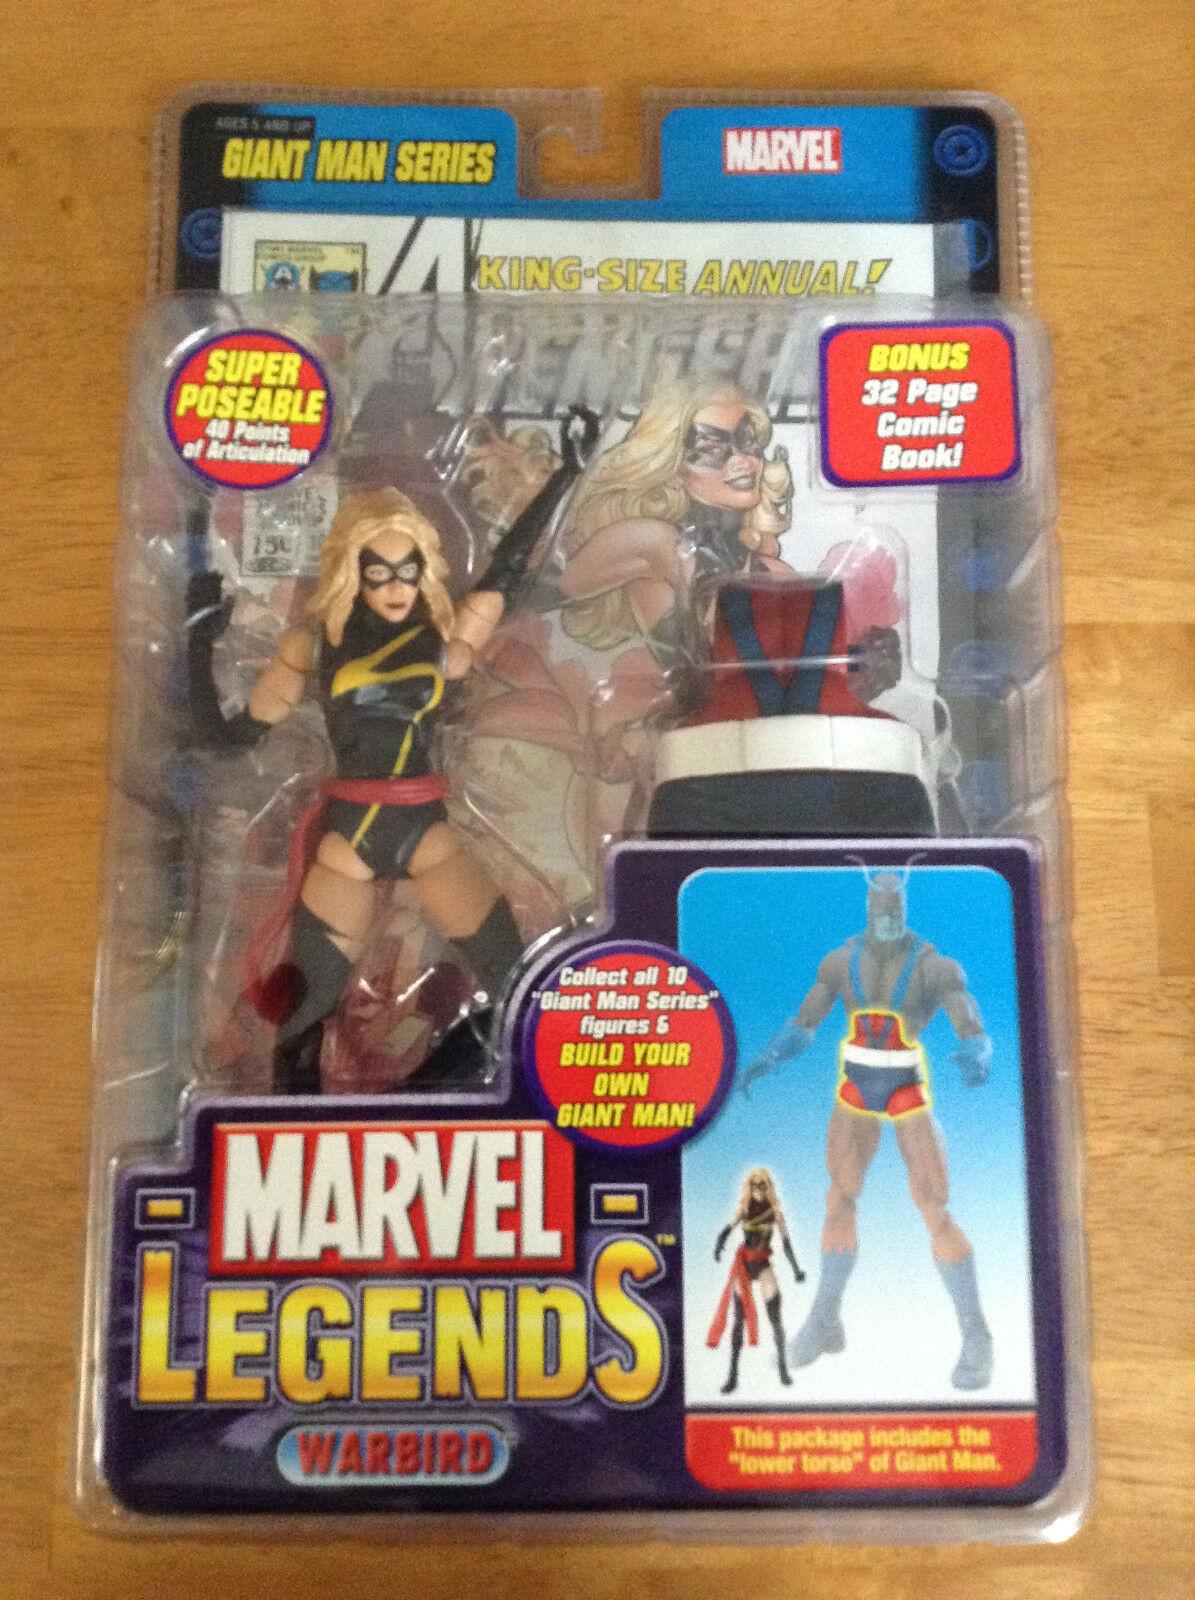 Marvel Legends NEW - Warbird   Ms MARVEL - Giantman BAF Lower Torso AVENGERS